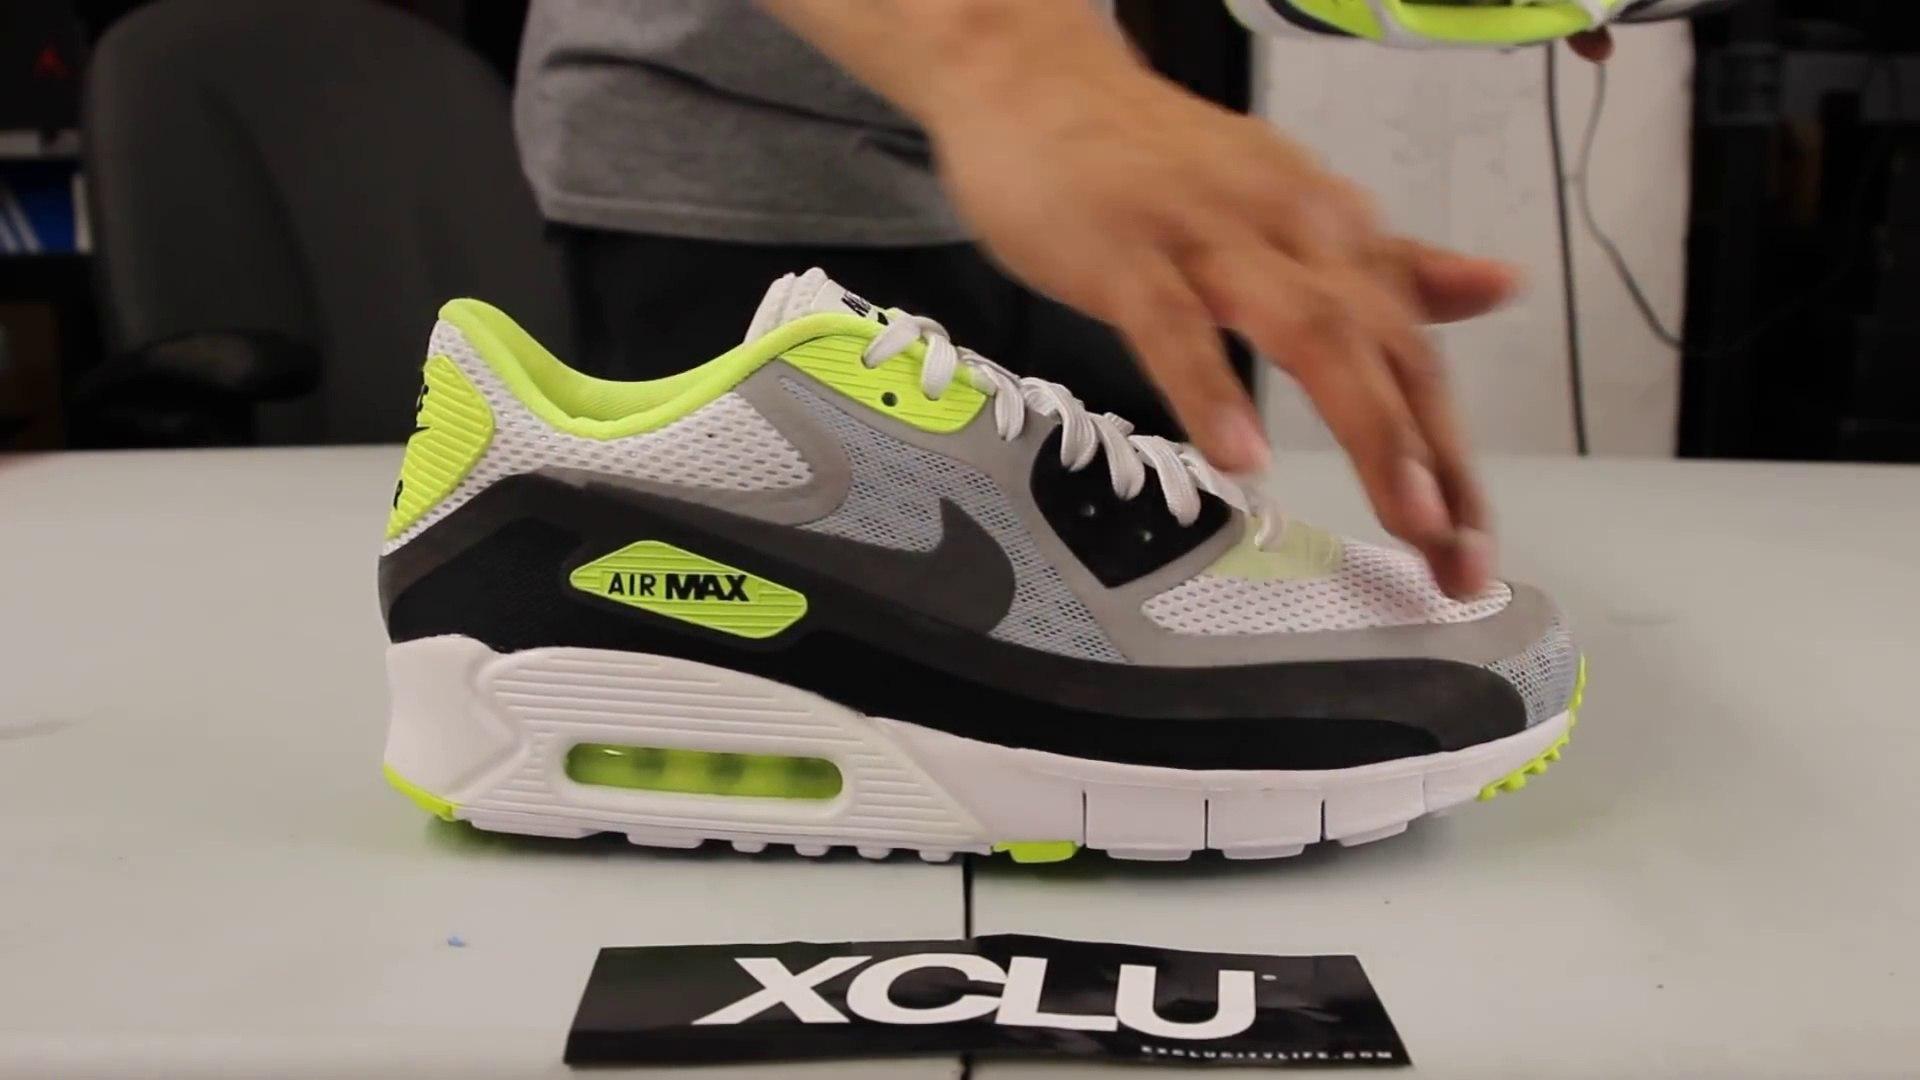 wombazaar Nike Air Max 90 Breath Volt Unboxing Video at